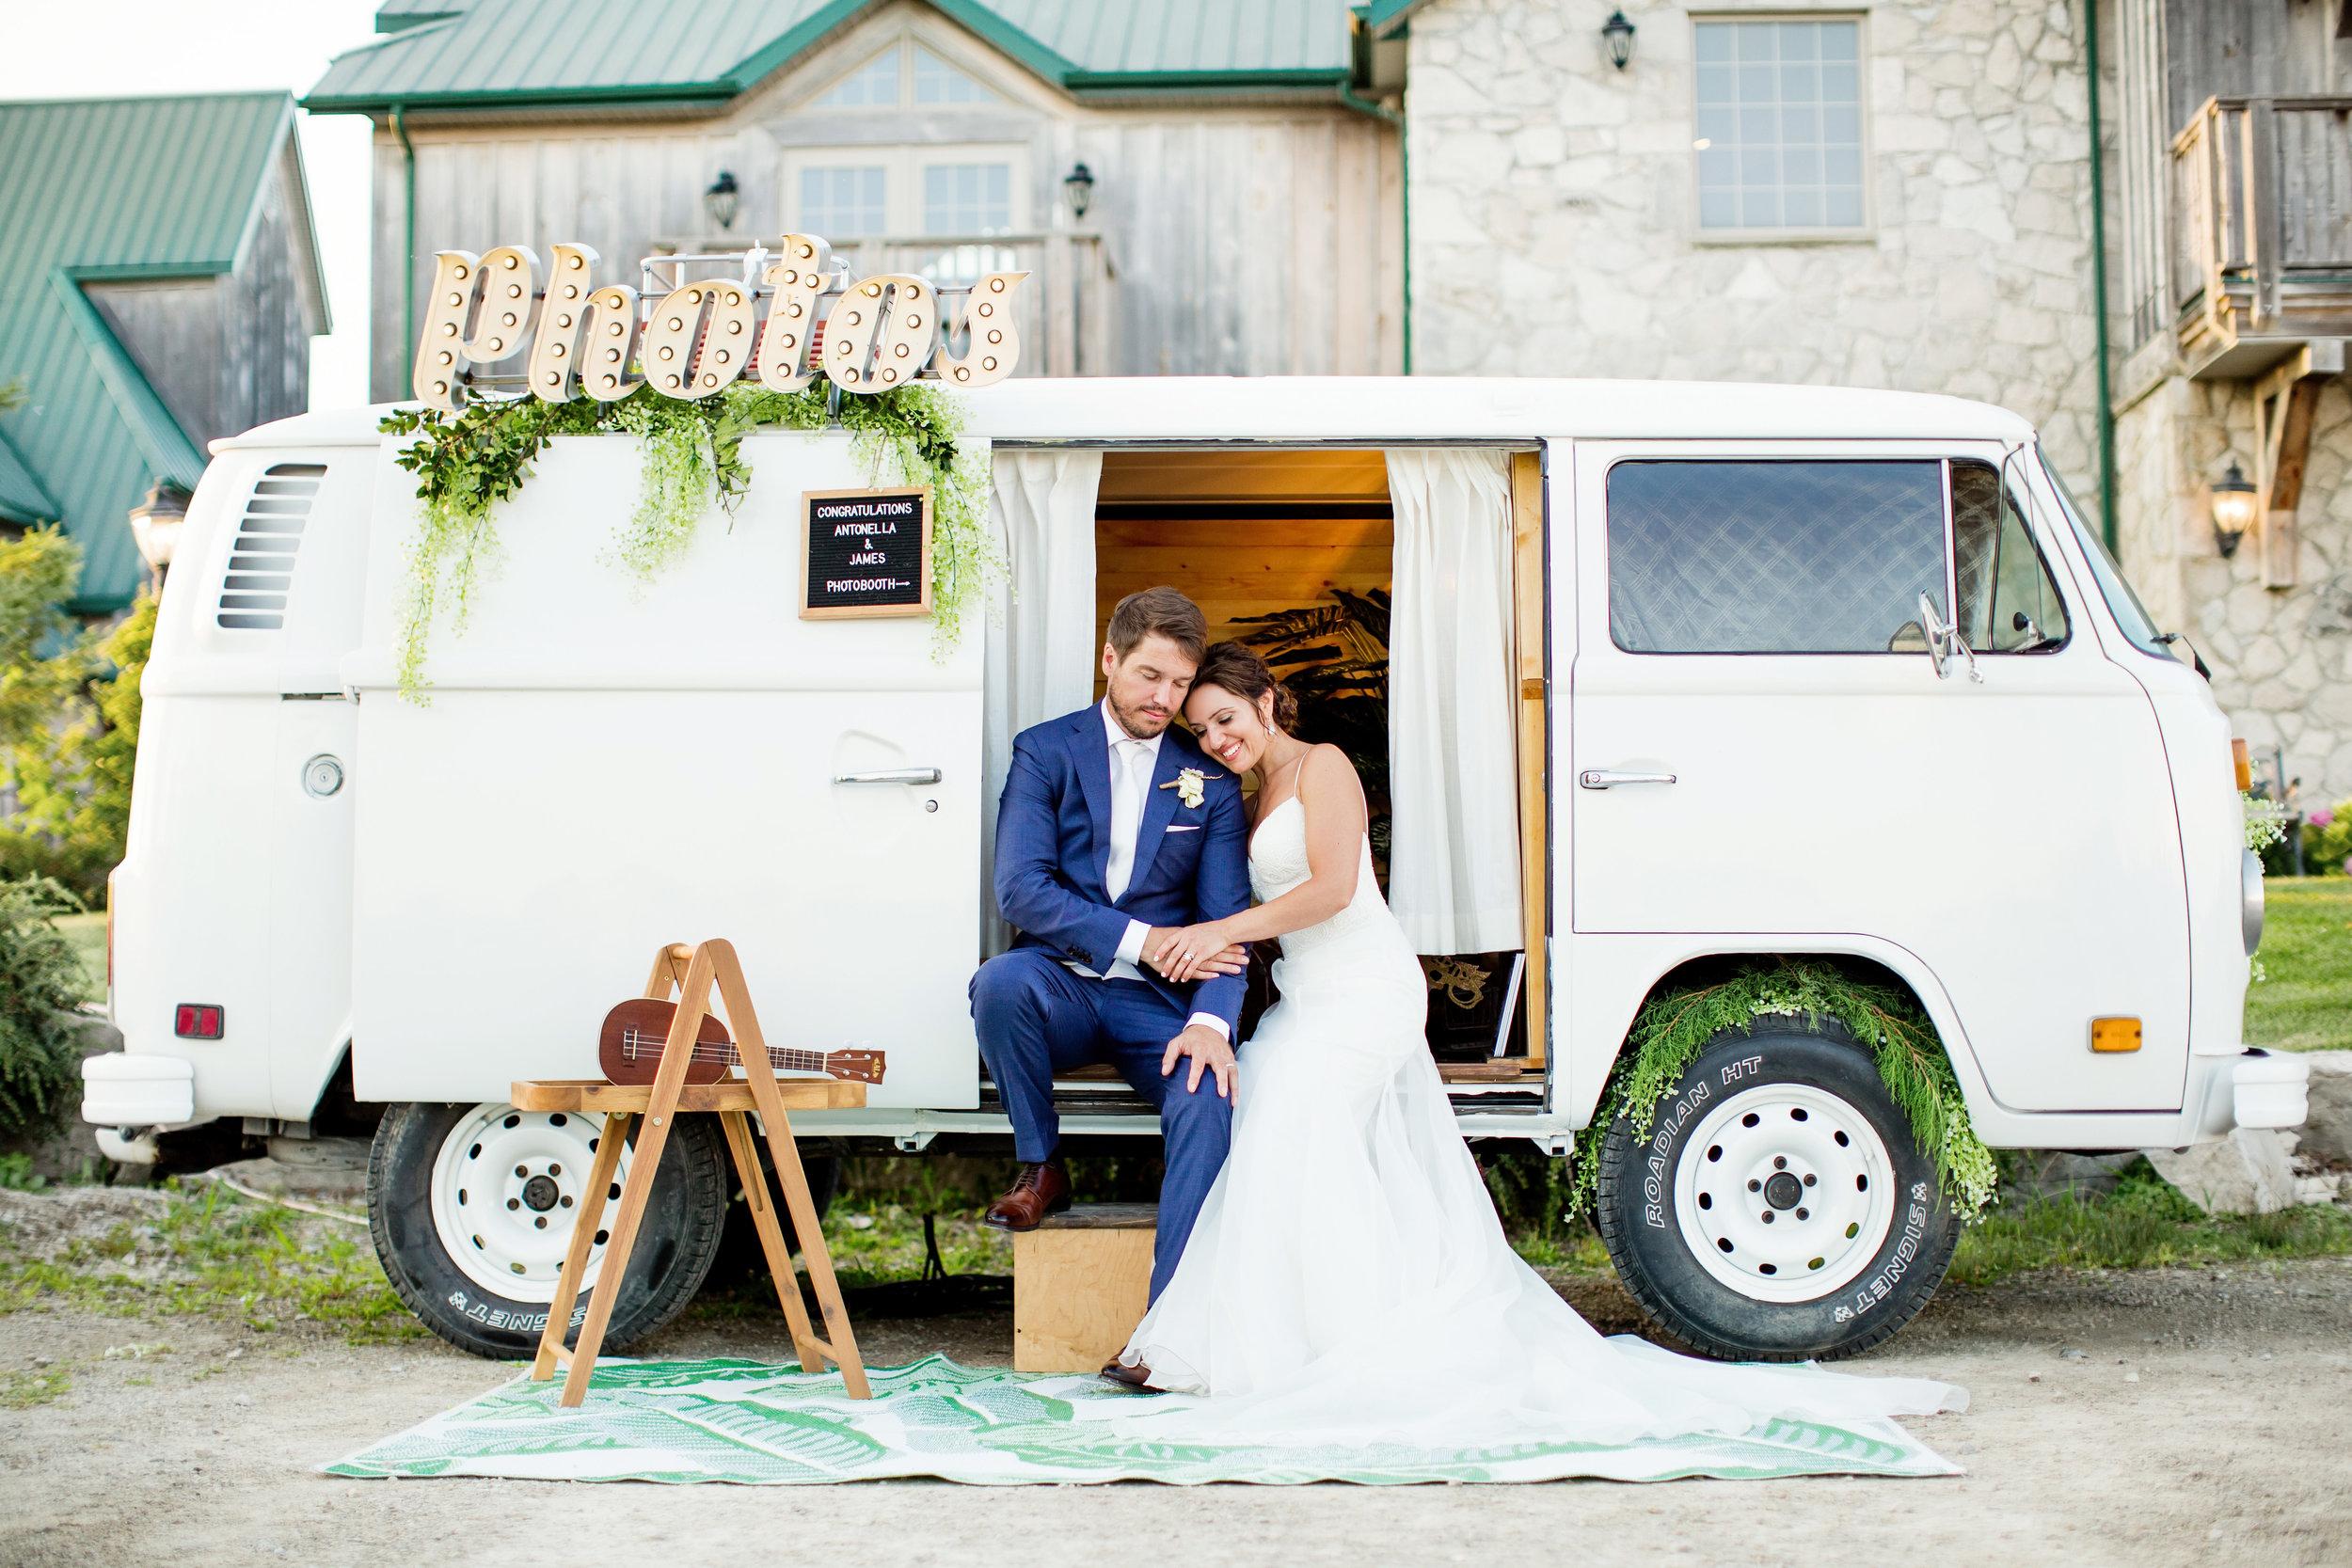 stylish-wedding-photography-windsor-toronto-ontario-wedding-photographer-winery-eryn-shea-photography-01.jpg